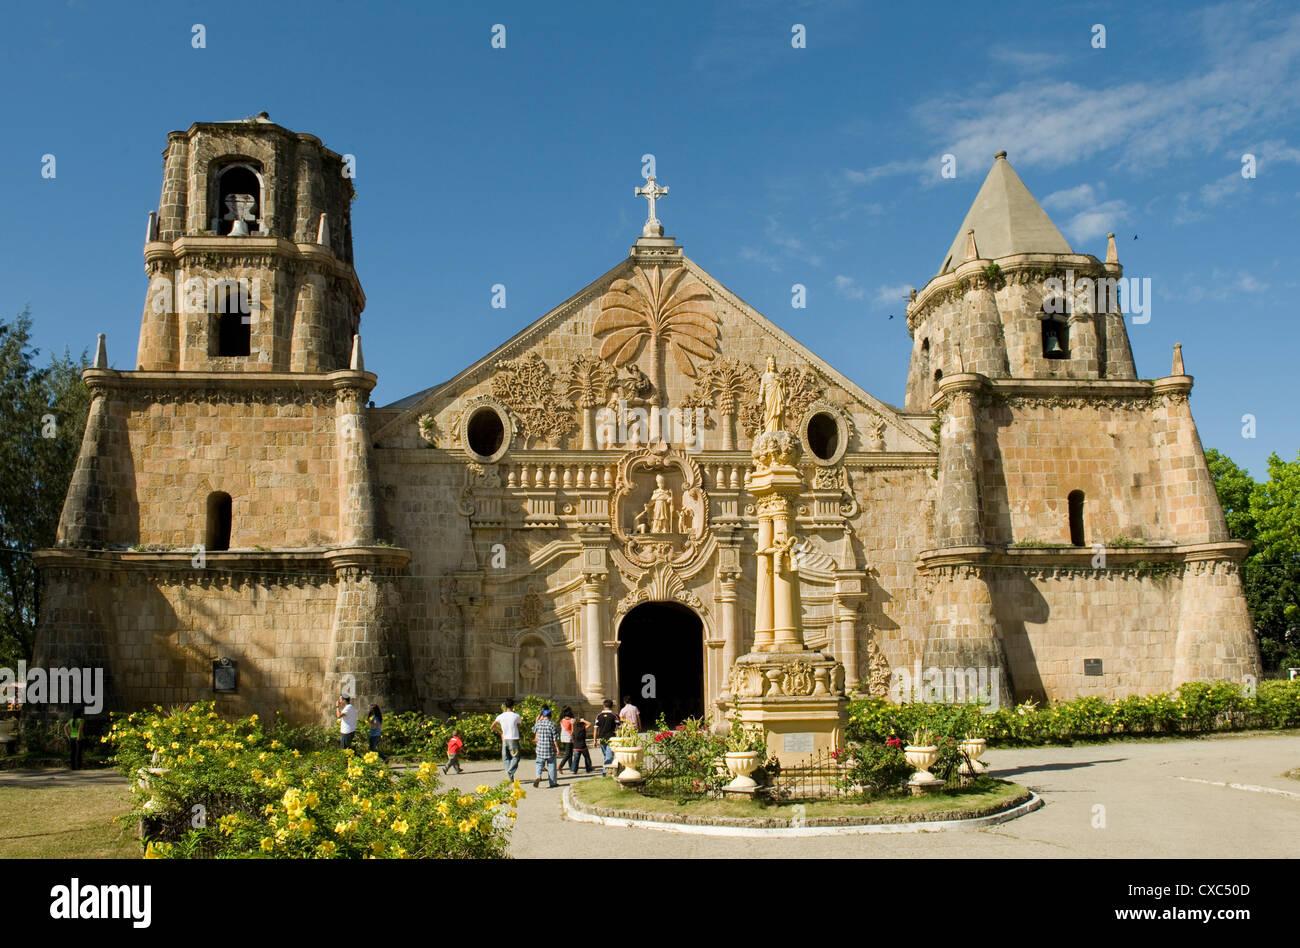 Miagao Kirche erbaut 1797, kürzlich restauriert, UNESCO-Weltkulturerbe, Iloilo, Panay, Philippinen, Südostasien, Stockbild